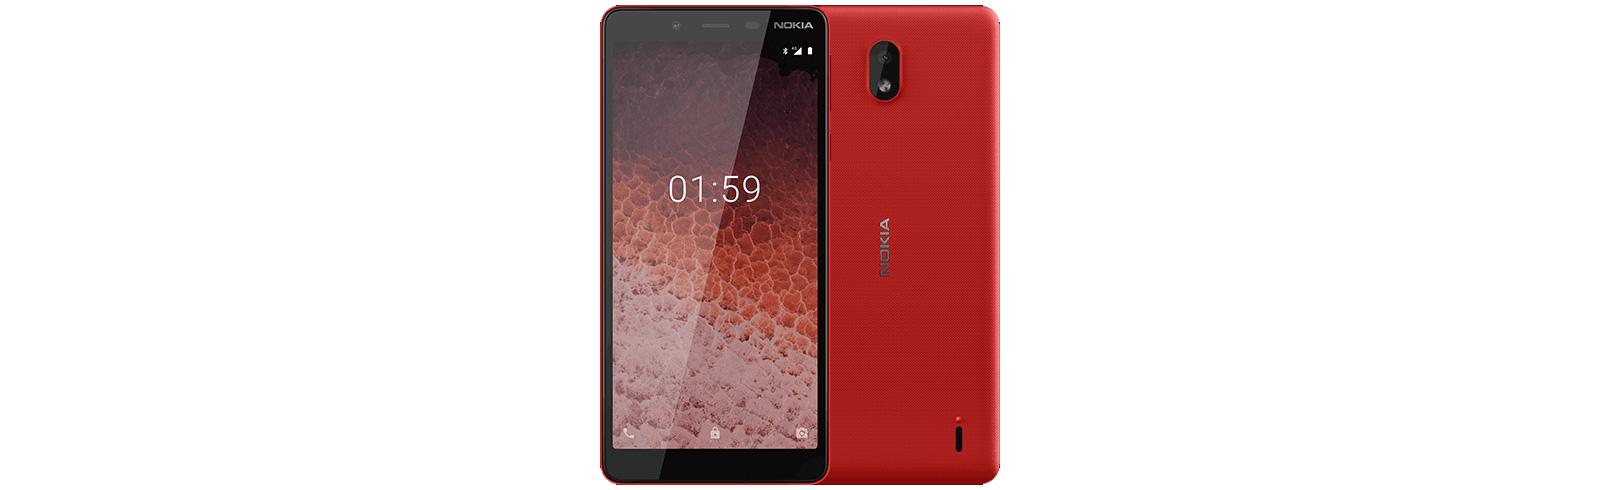 Nokia 1 Plus, Nokia 3.2 and Nokia 4.2 are announced with Android 9 Pie